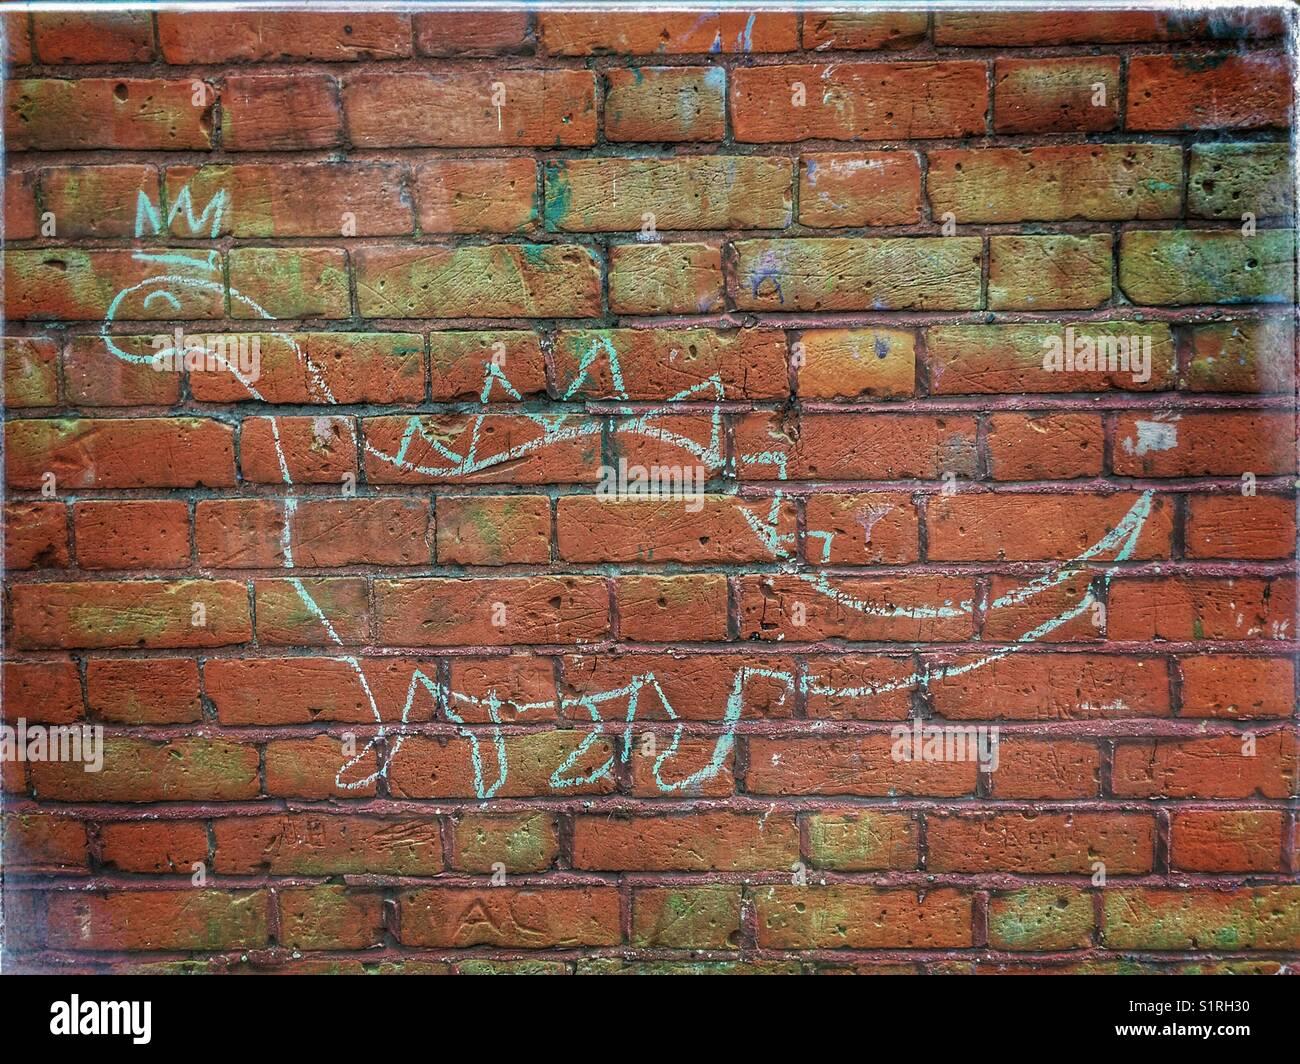 Chalk drawing of a brontosaurus dinosaur on a brick wall - Stock Image